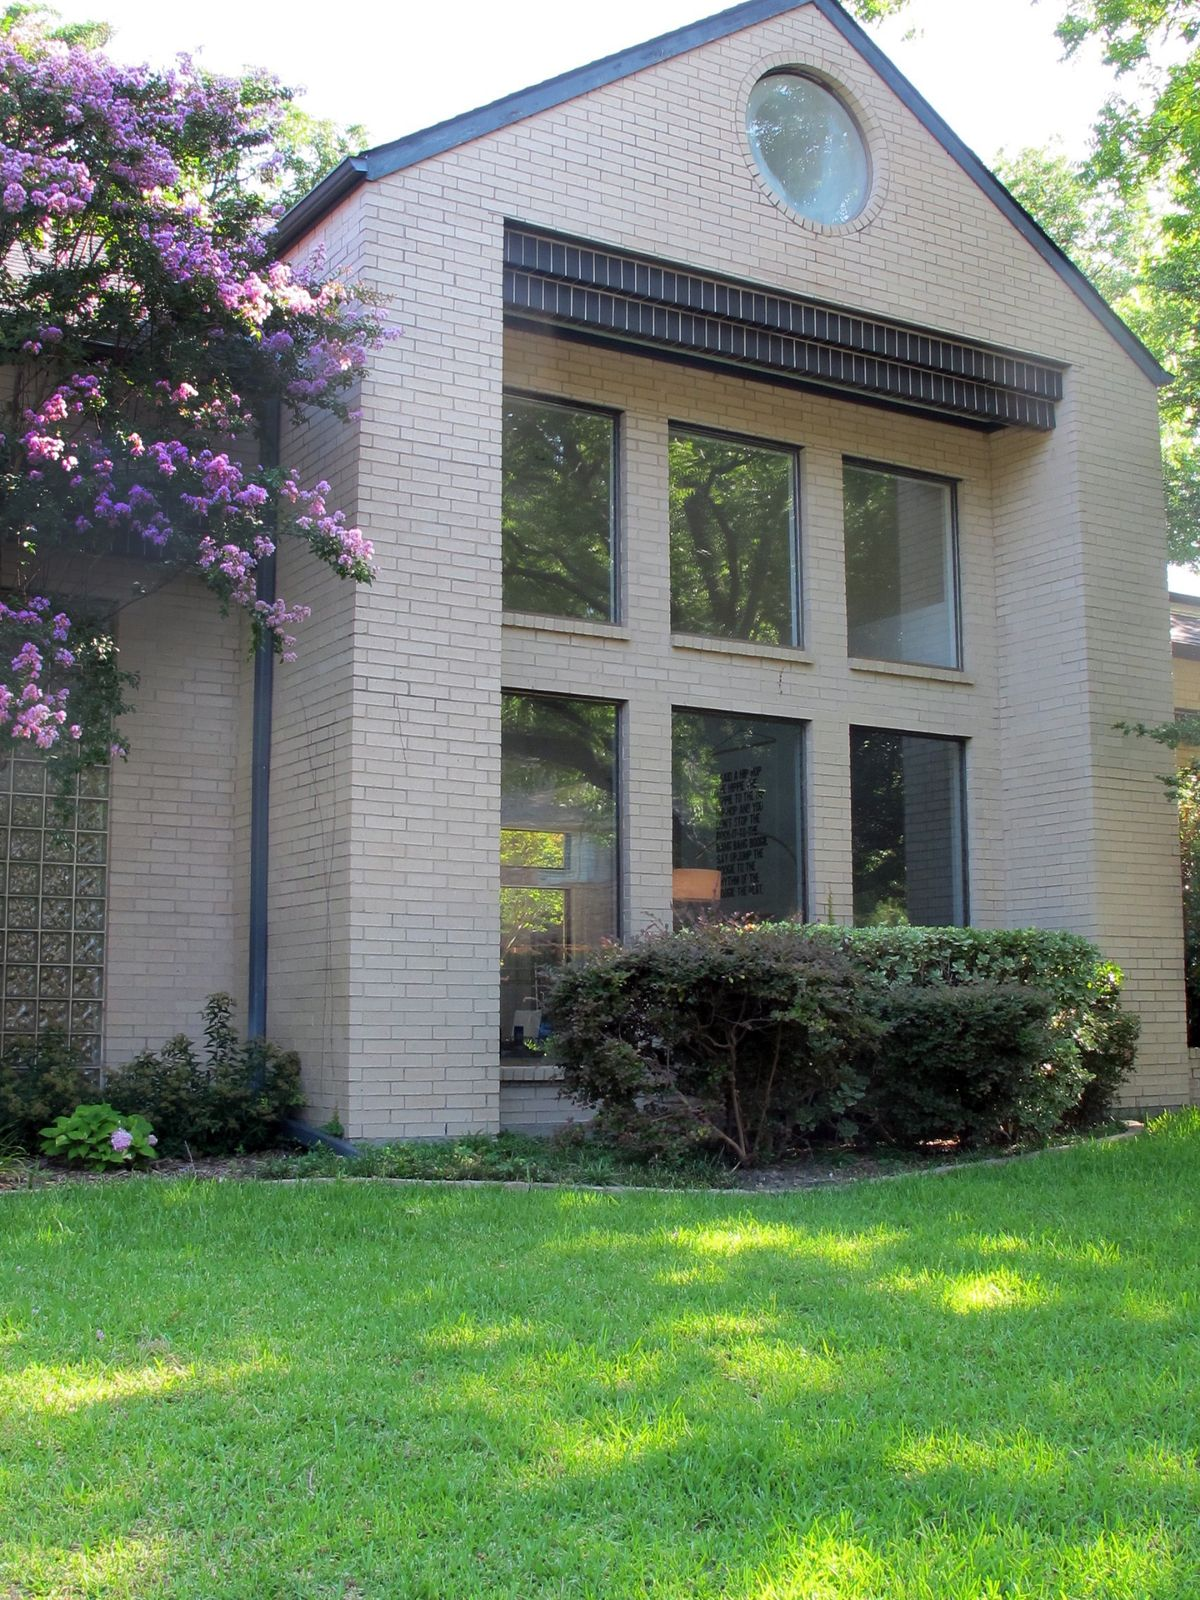 Kirkpatrick Contemporary Home Photo Video Shoot Location Dallas 33.jpg